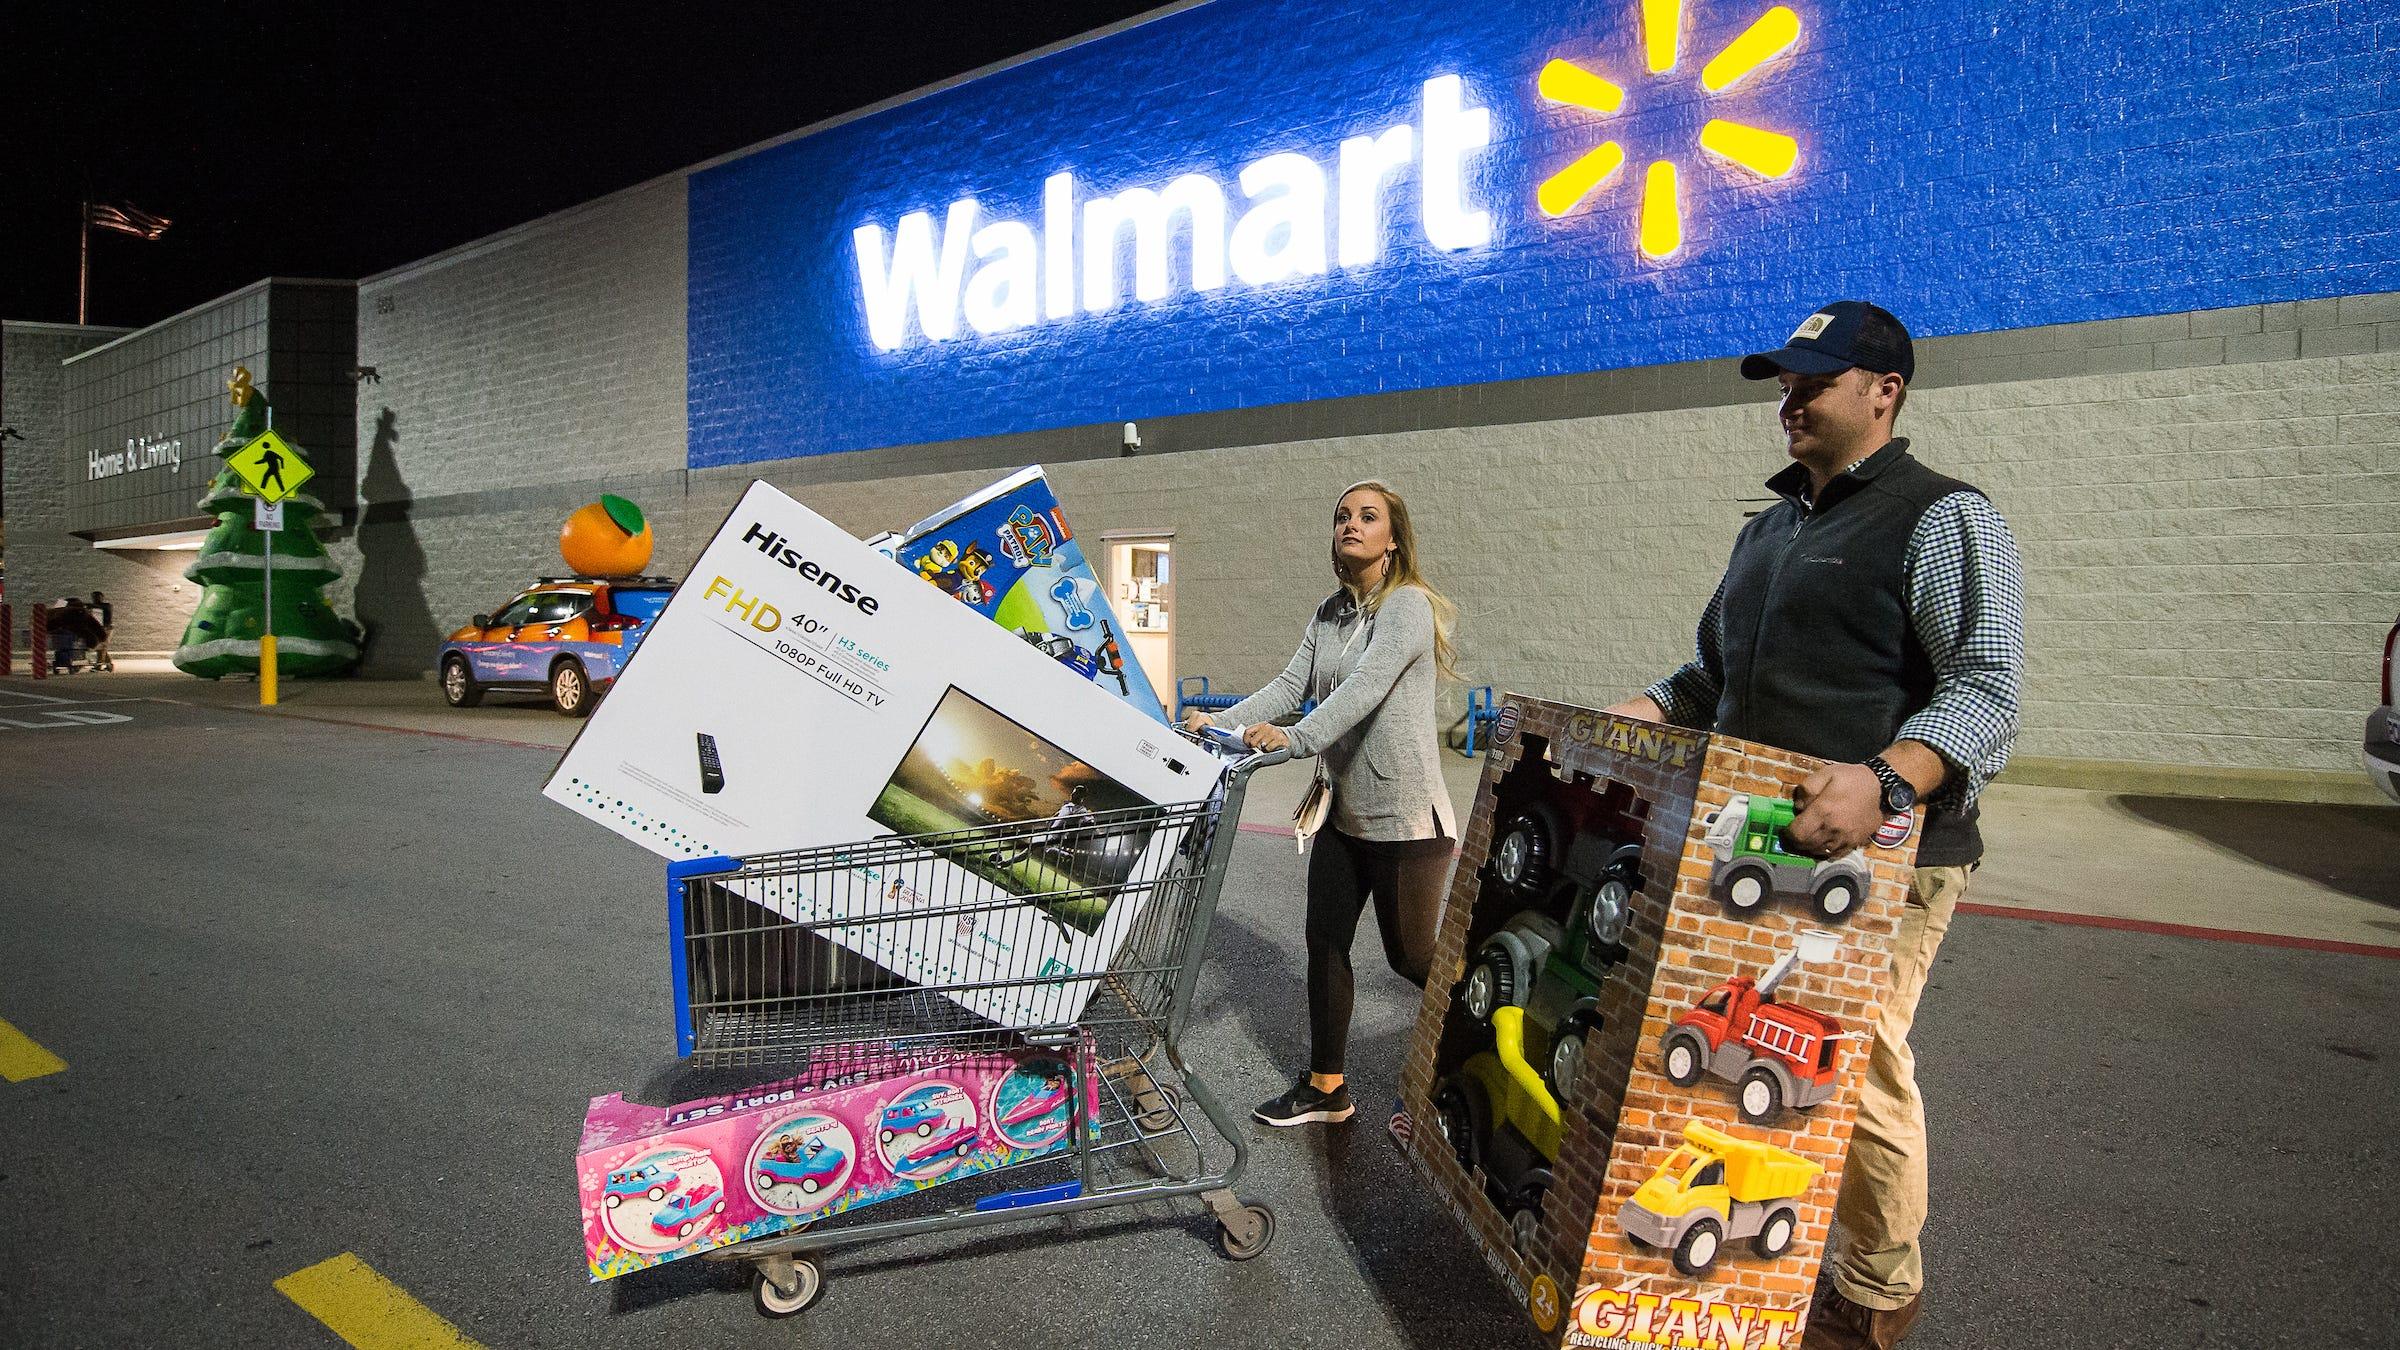 Walmart Black Friday Ad 2019 Televisions Electronics Toy Deals